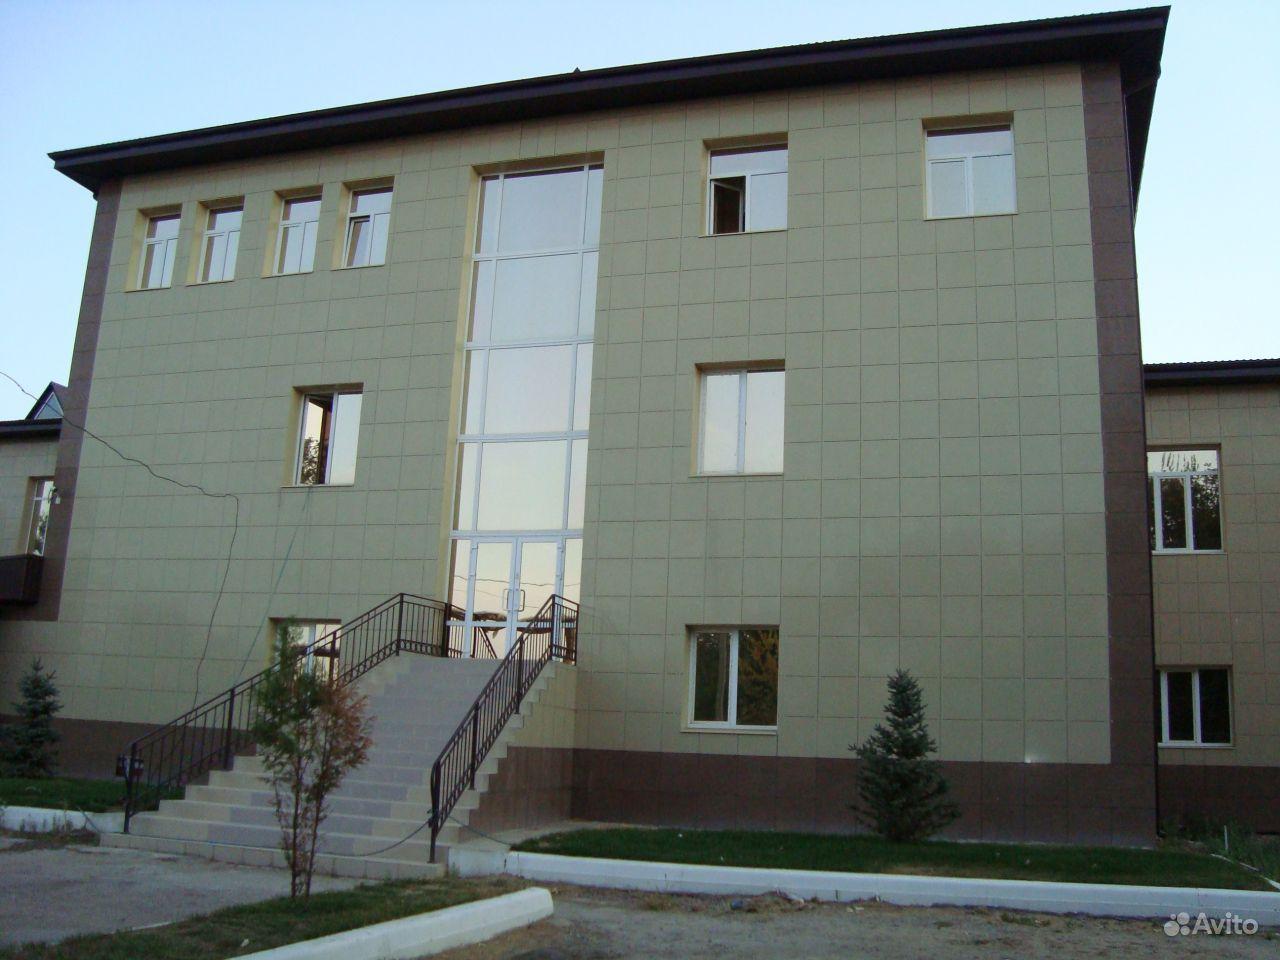 Недвижимость в Астрахани N3 ru